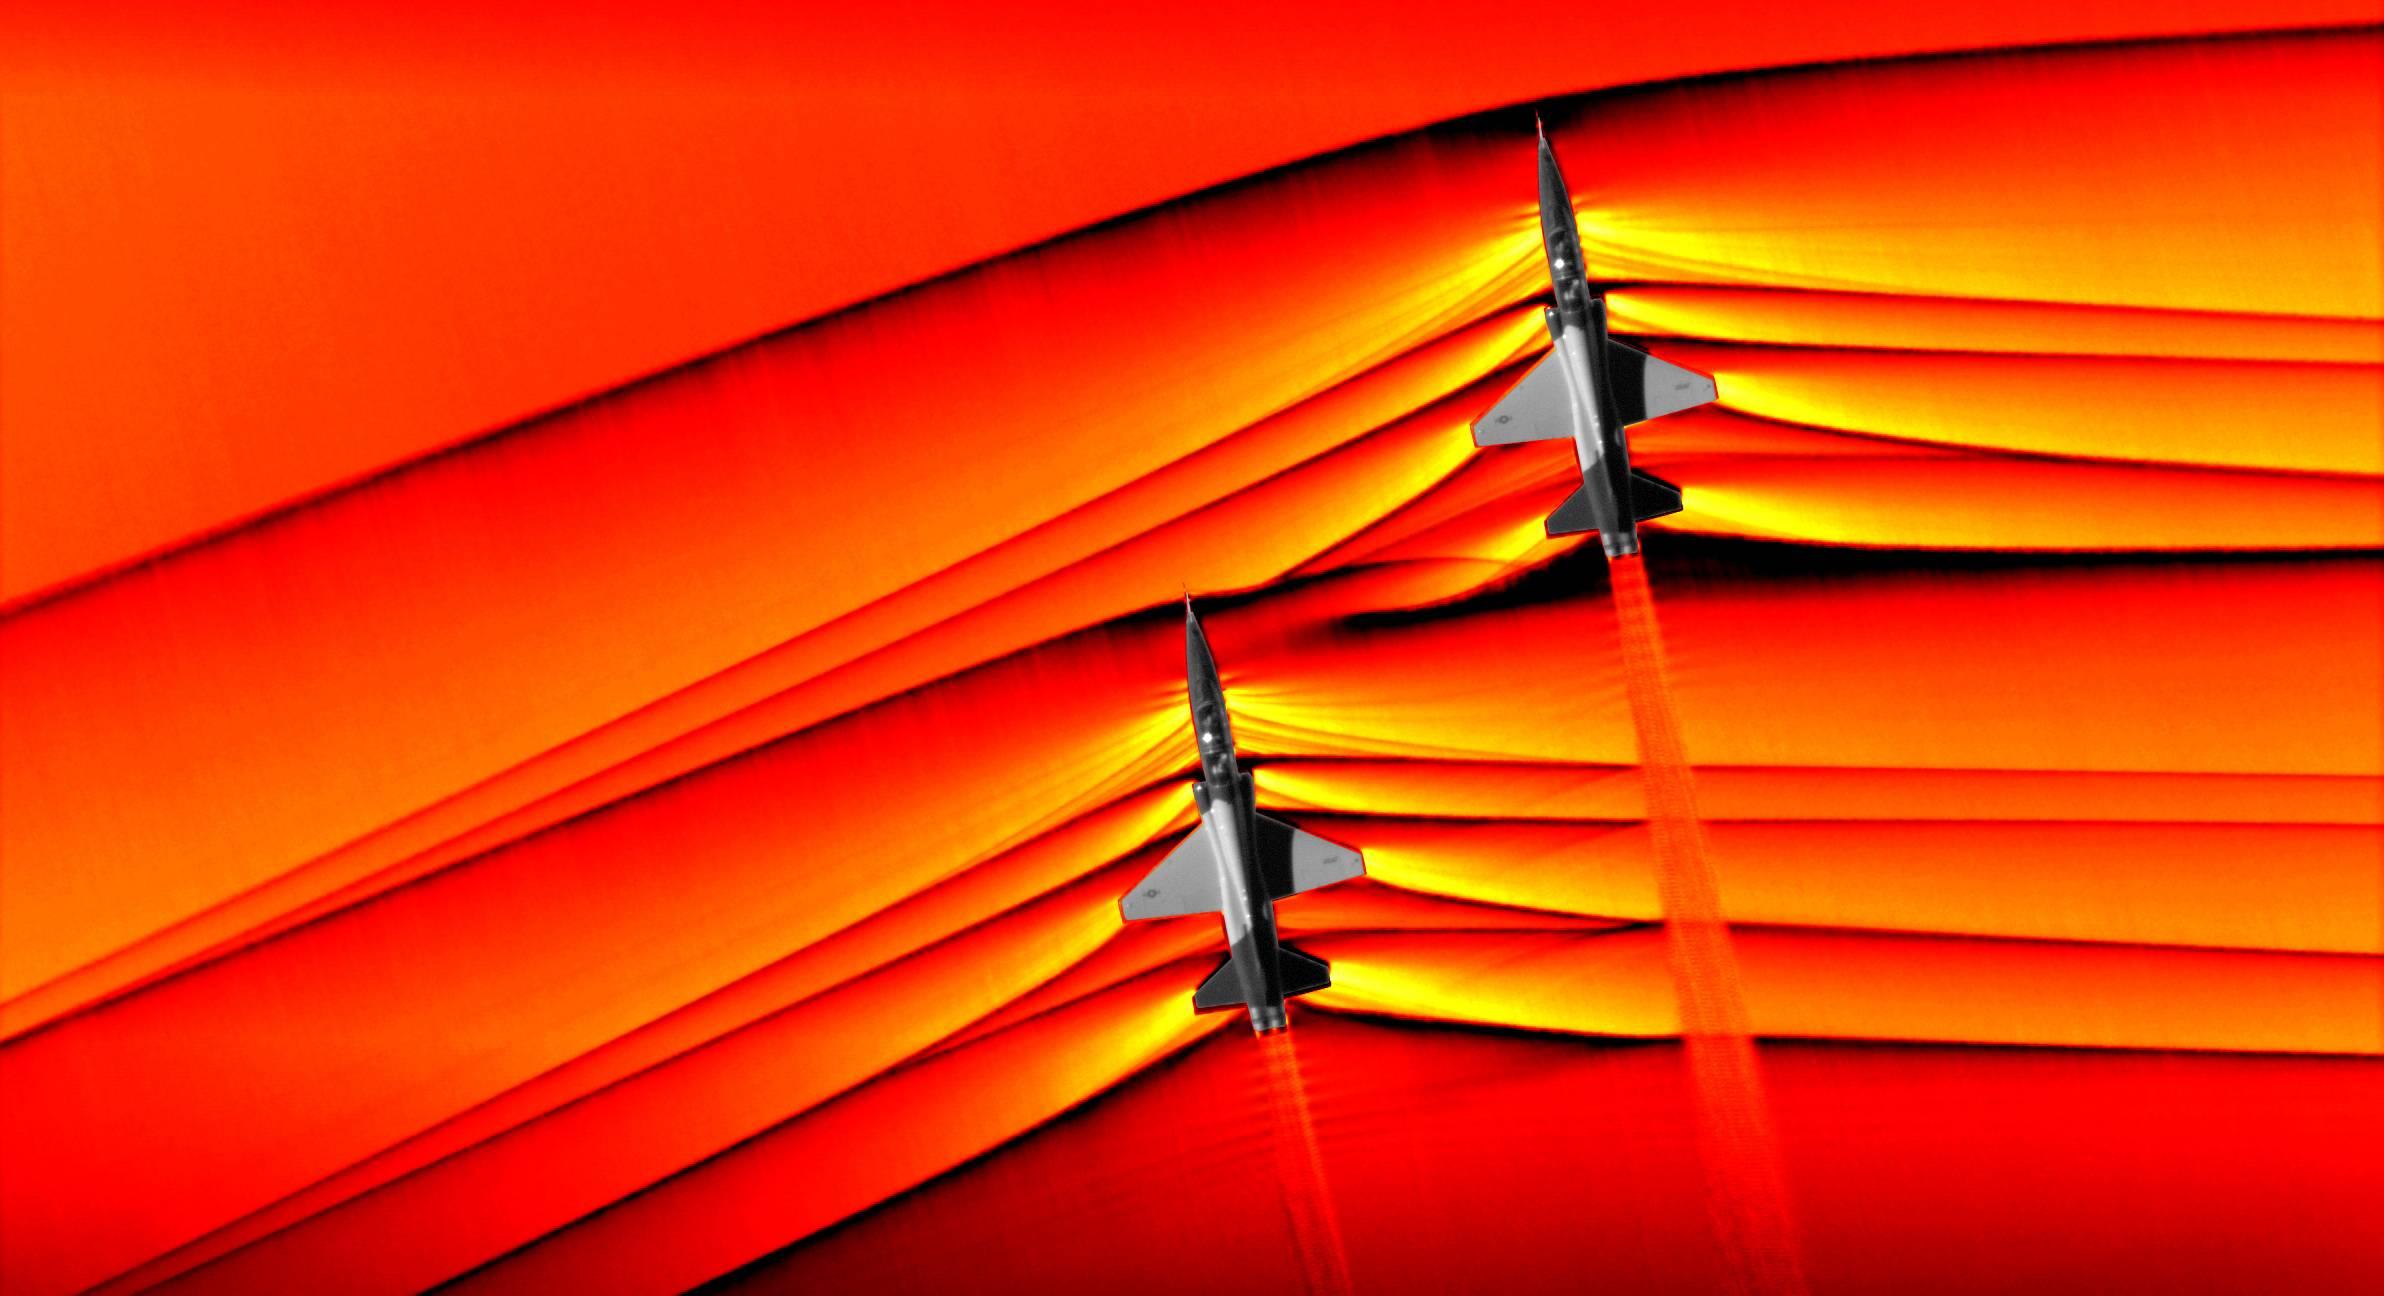 Megapixels: What a sonic boom looks like